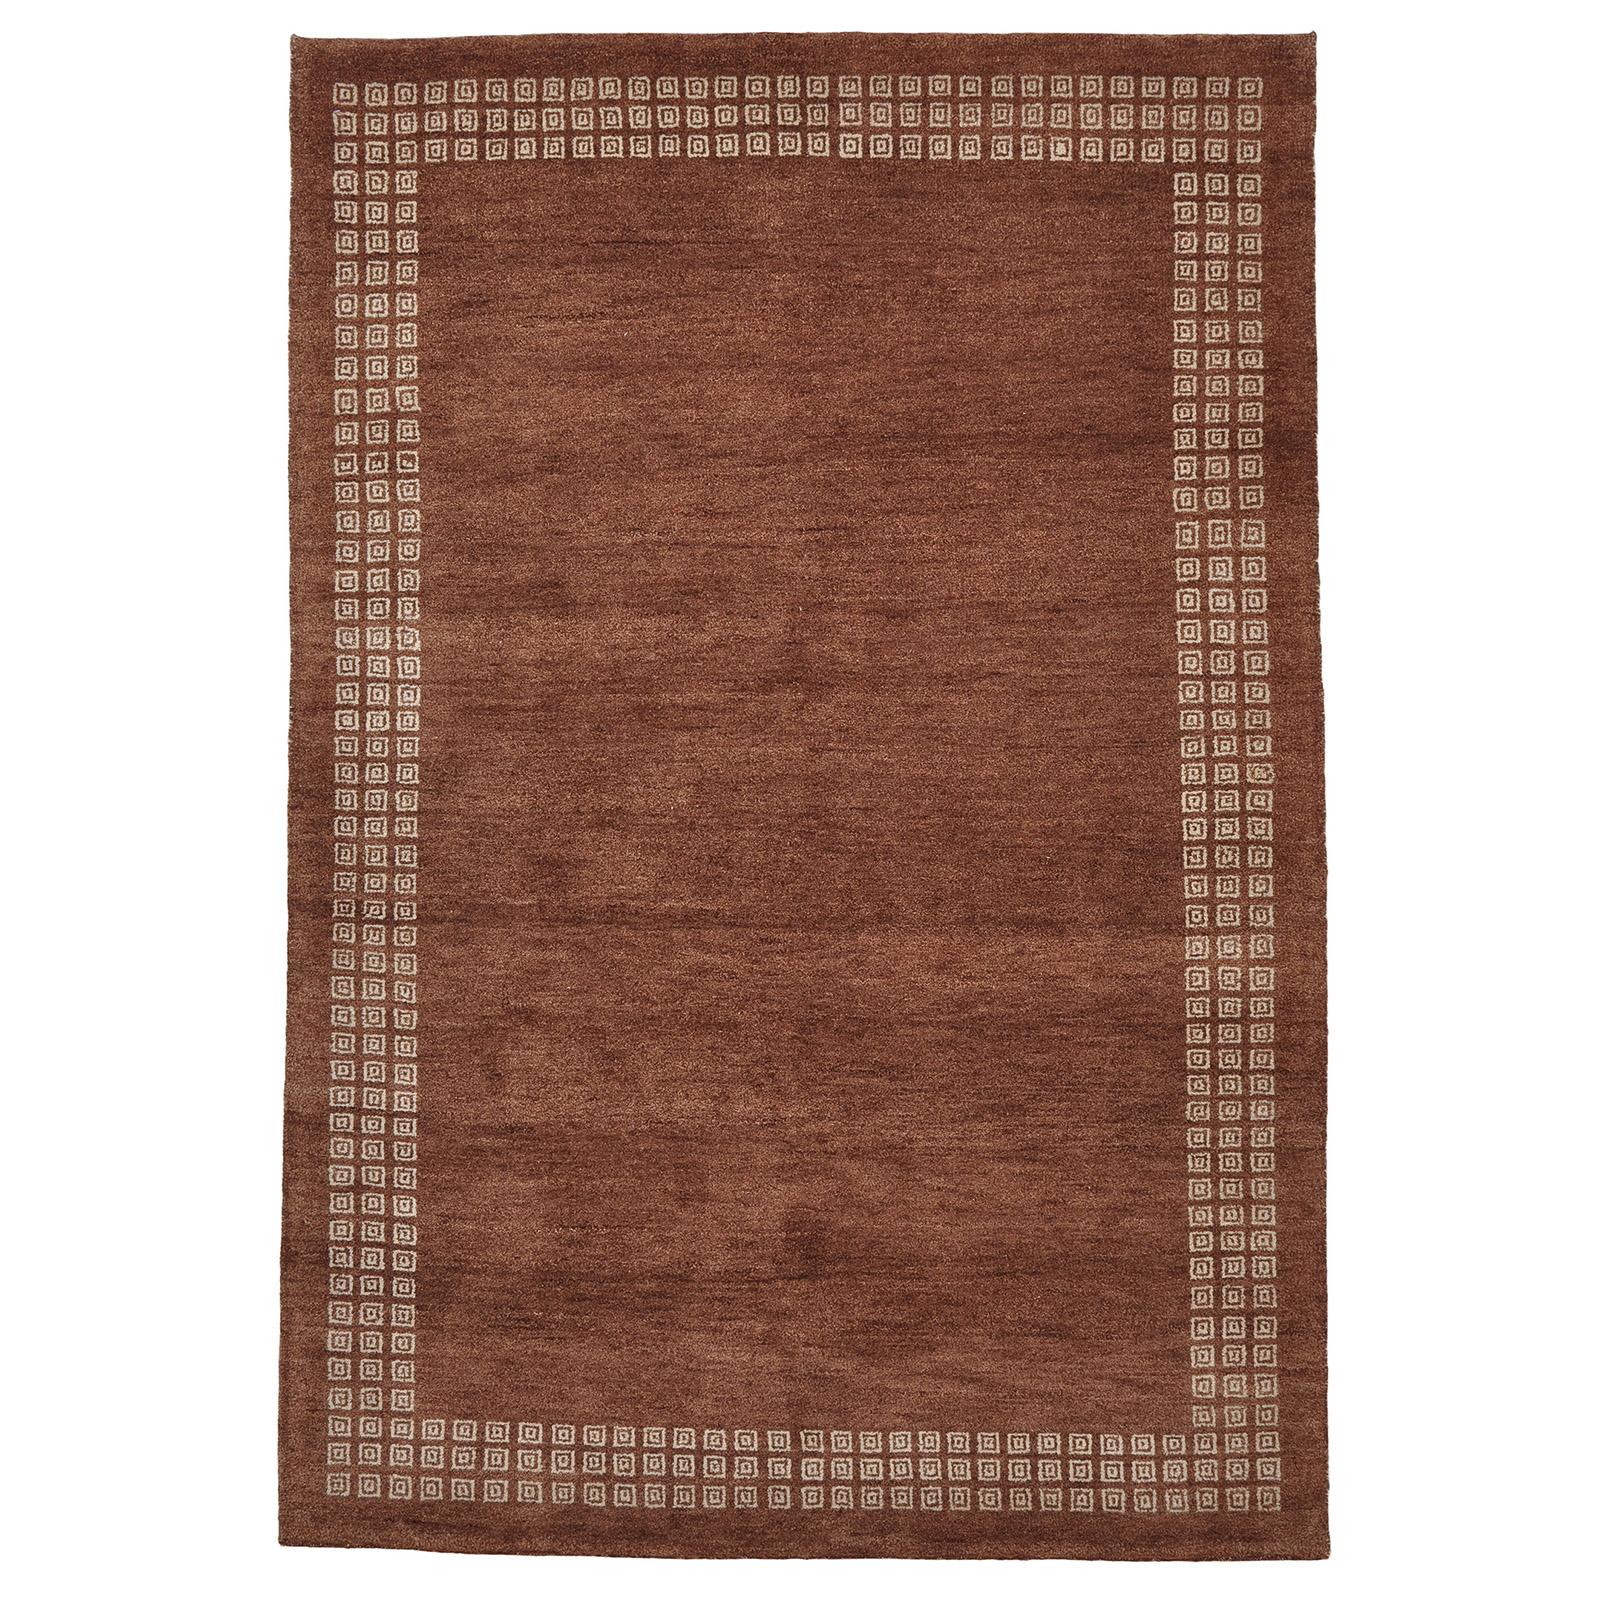 Indo Gabbeh matta storlek 200x137 cm